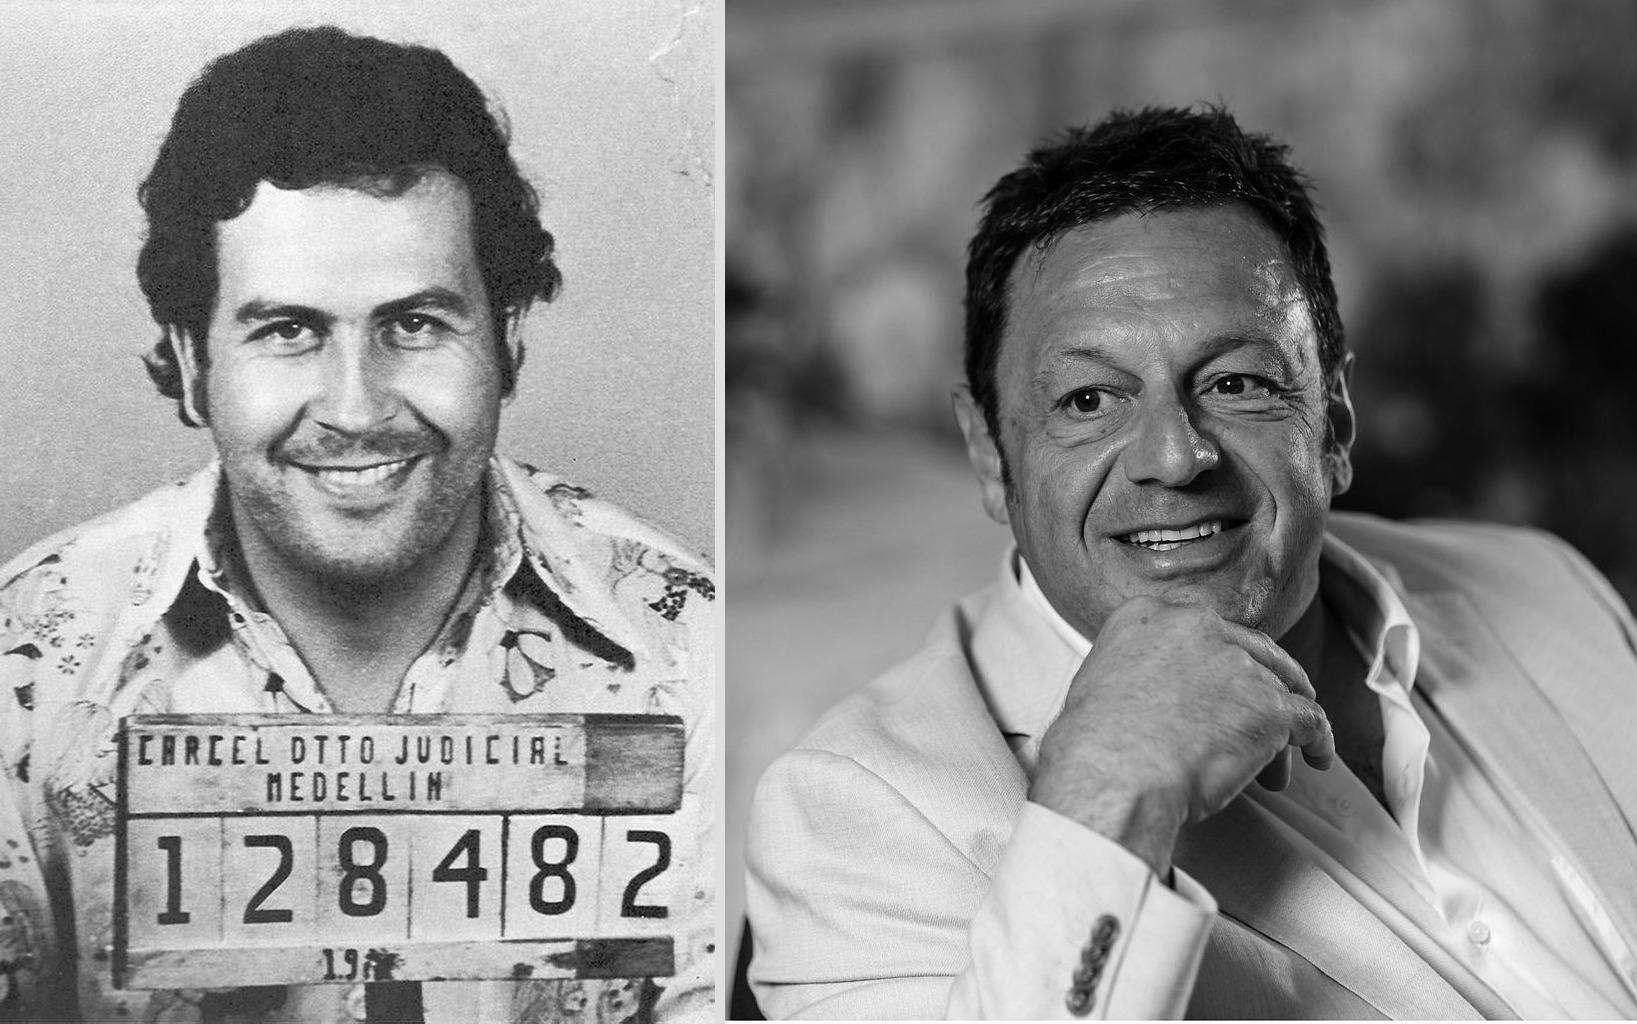 Phillip Witcomb, Pablo Escobar's Son, Has Released a Memoir